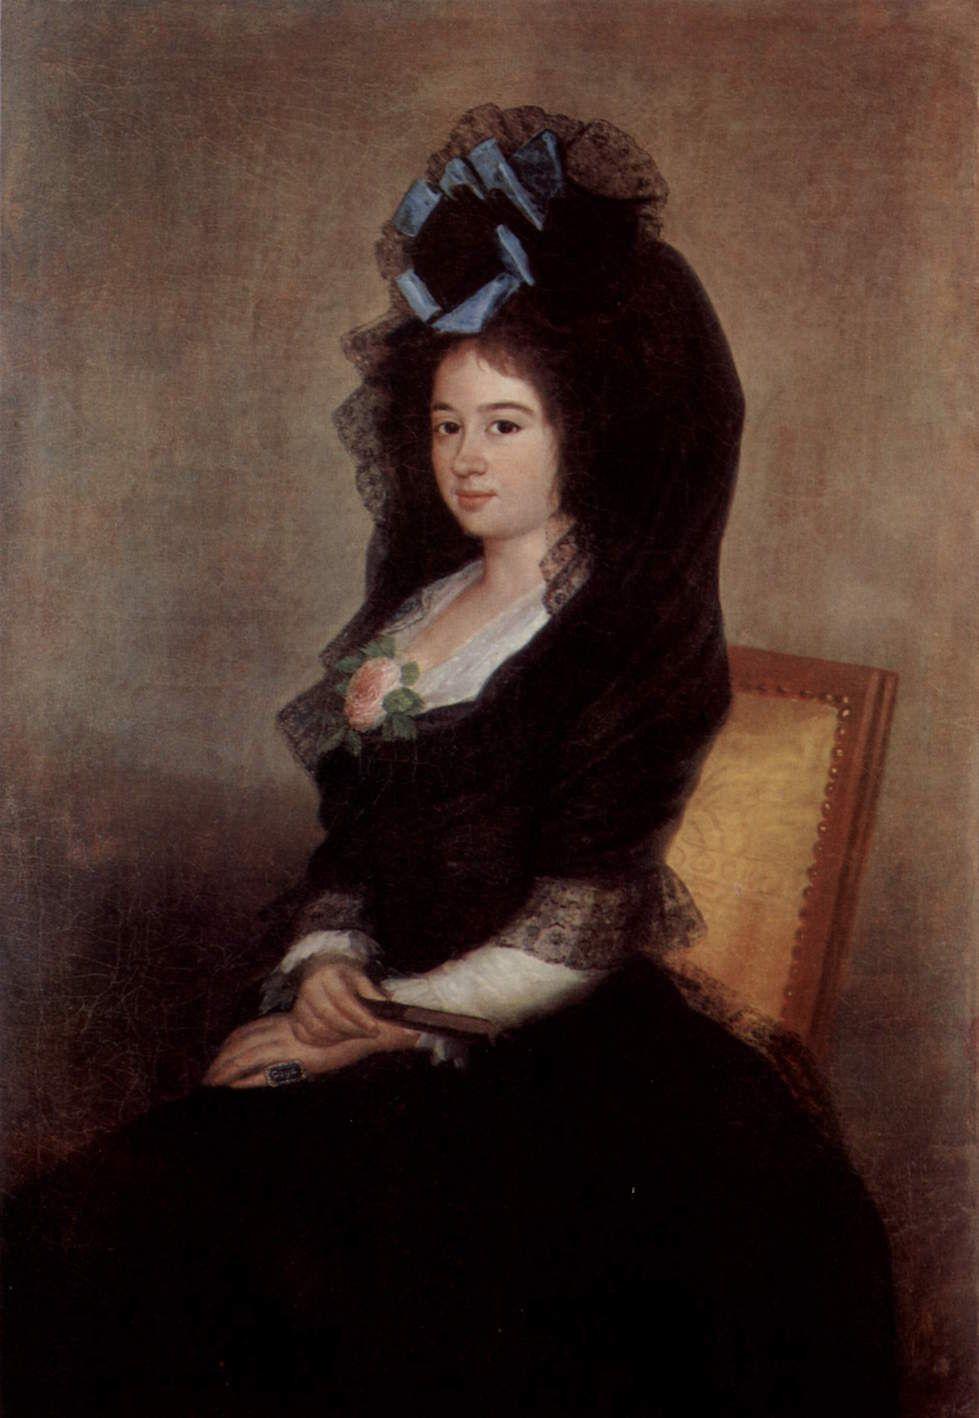 Francisco Goya. The portrait of Mrs. Narcisi of Barangay de Goicoechea